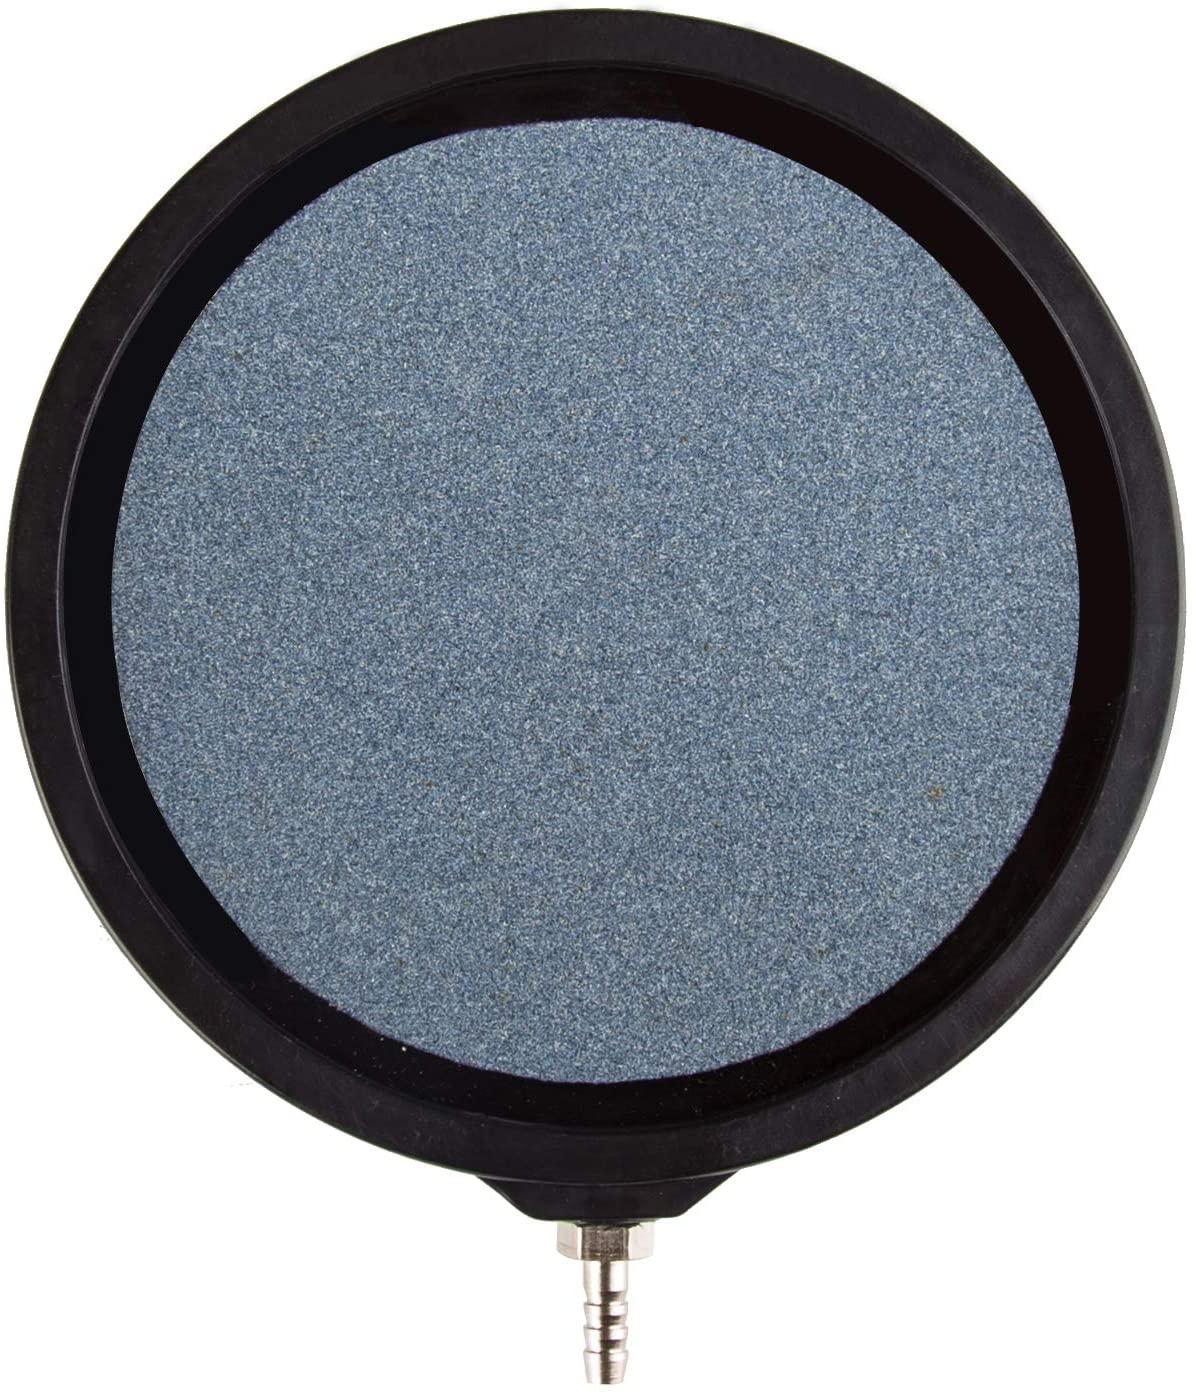 VIVOSUN 5 Inch Air Stone Disc with Shell for Hydroponics Aquarium Tank Pump